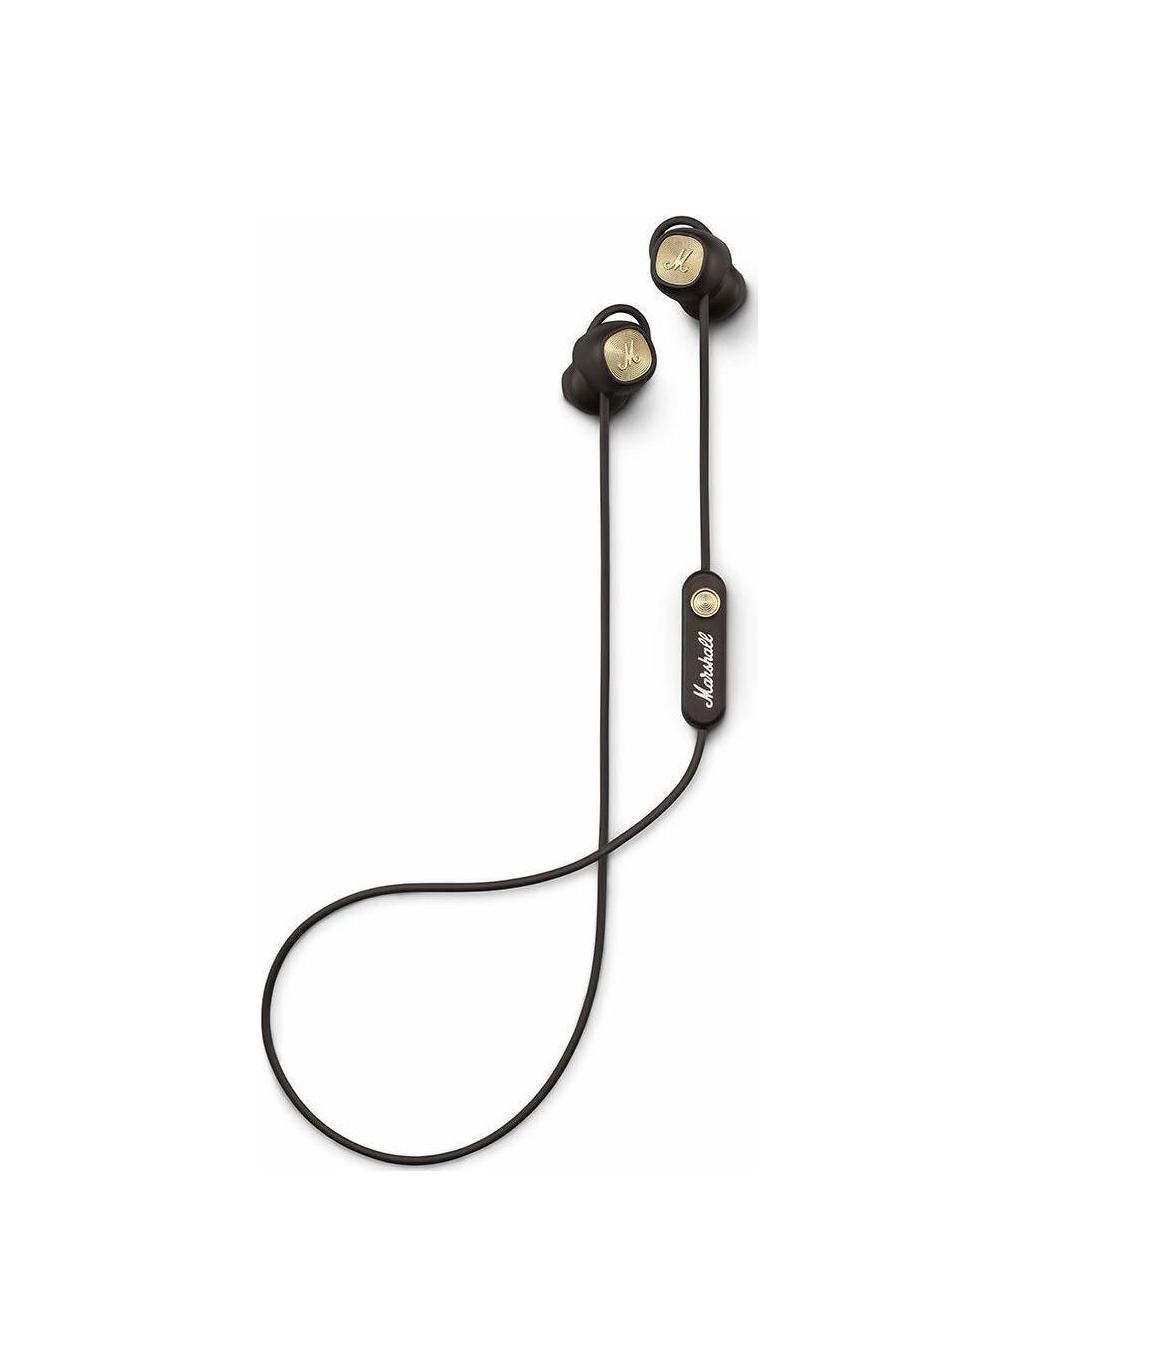 Marshall Minor II Bluetooth Ακουστικά Handsfree Brown